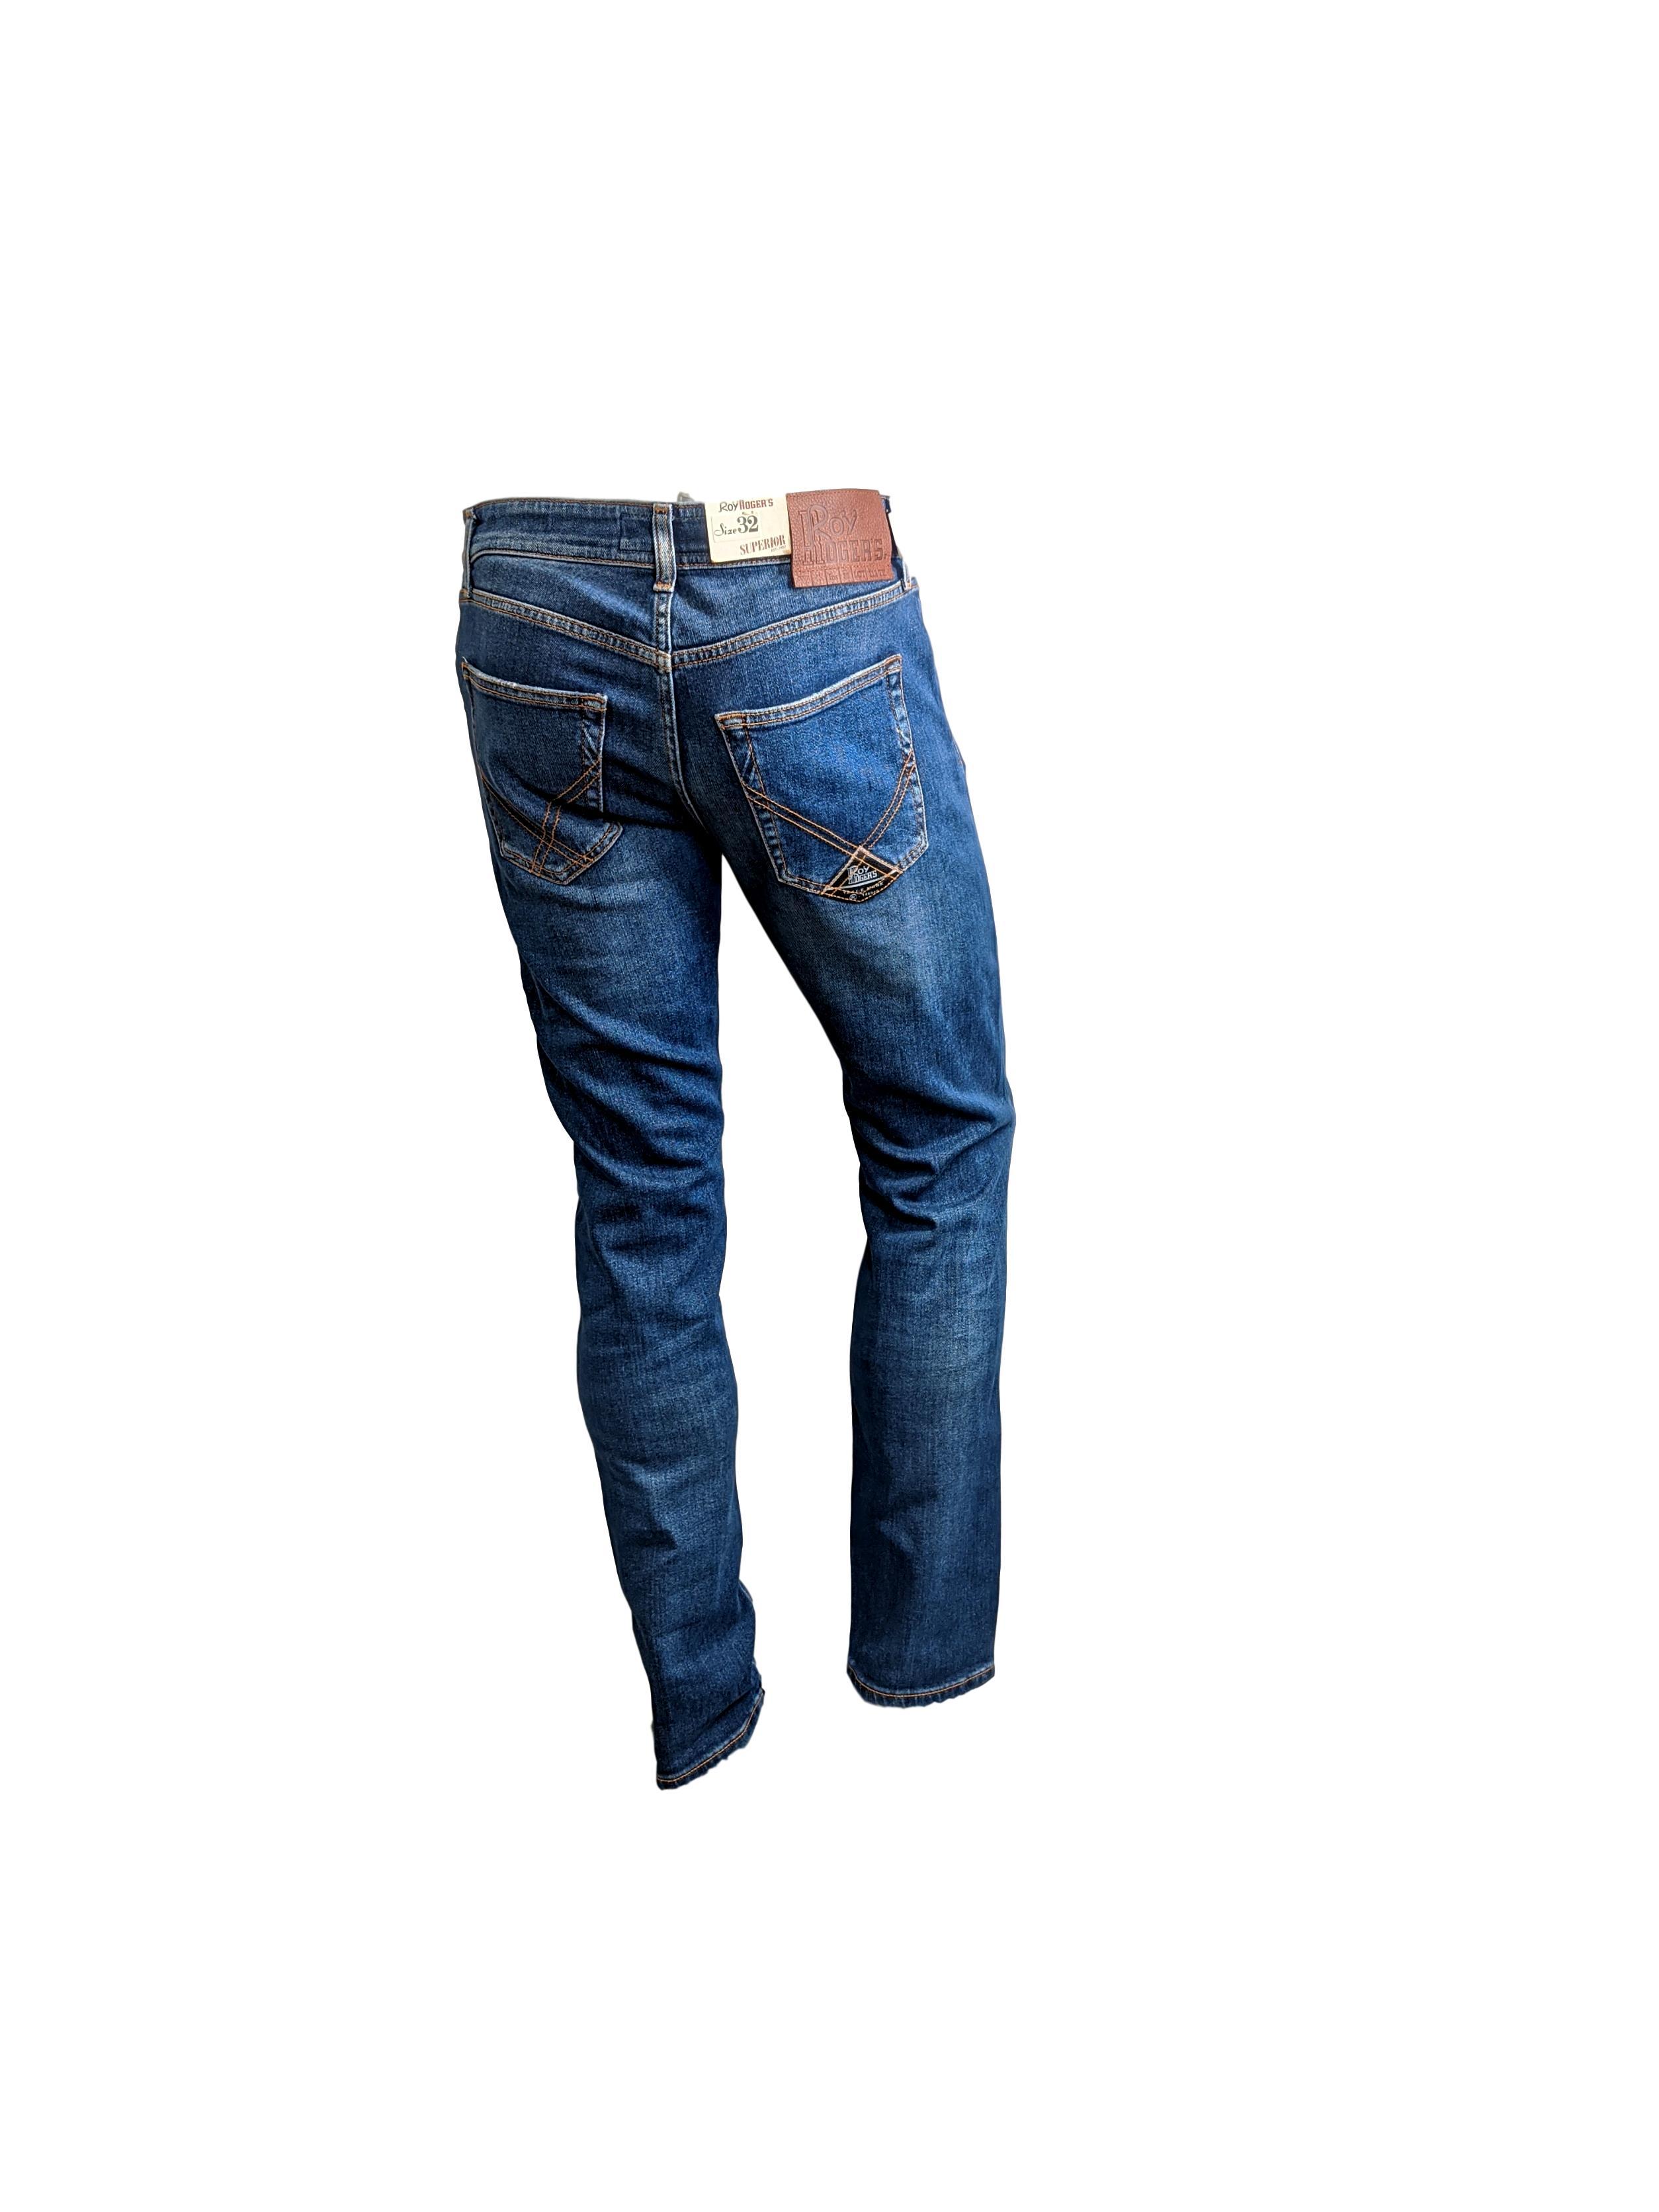 JEANS ROY ROGERS ROY ROGER'S | Jeans | RH.RIU000D008100740